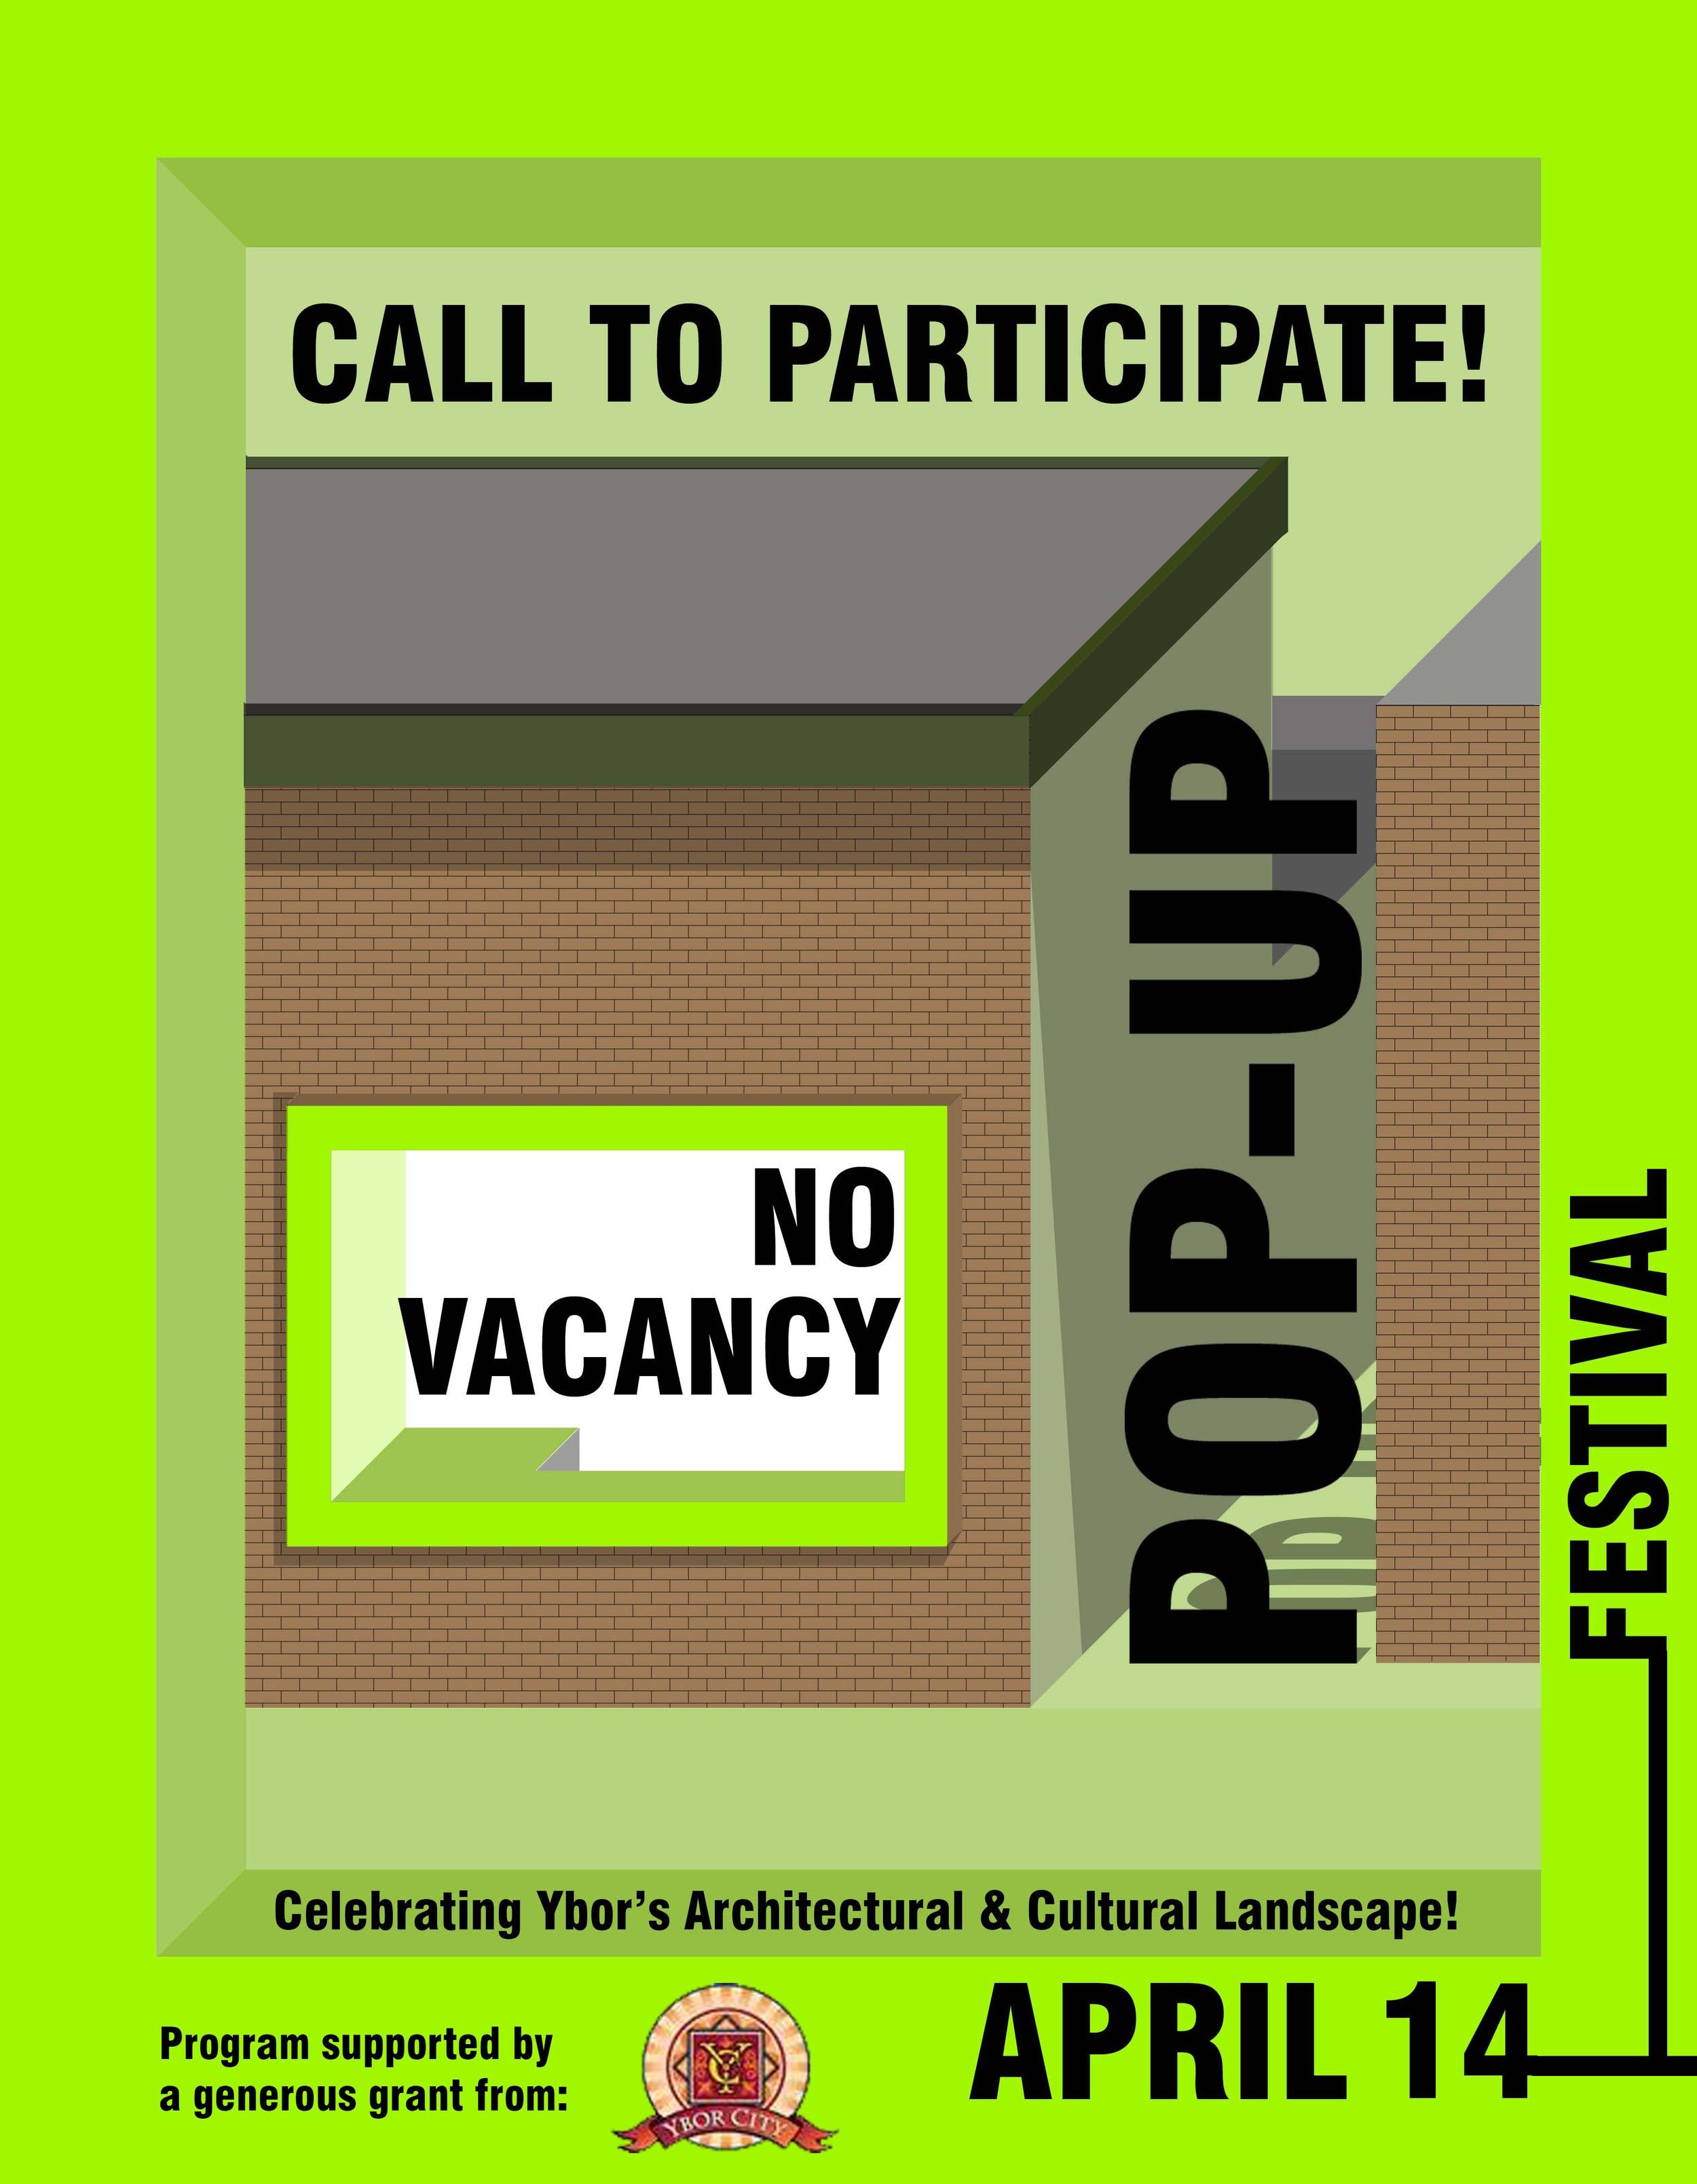 No Vacancy Pop-Up_web call for website.jpg